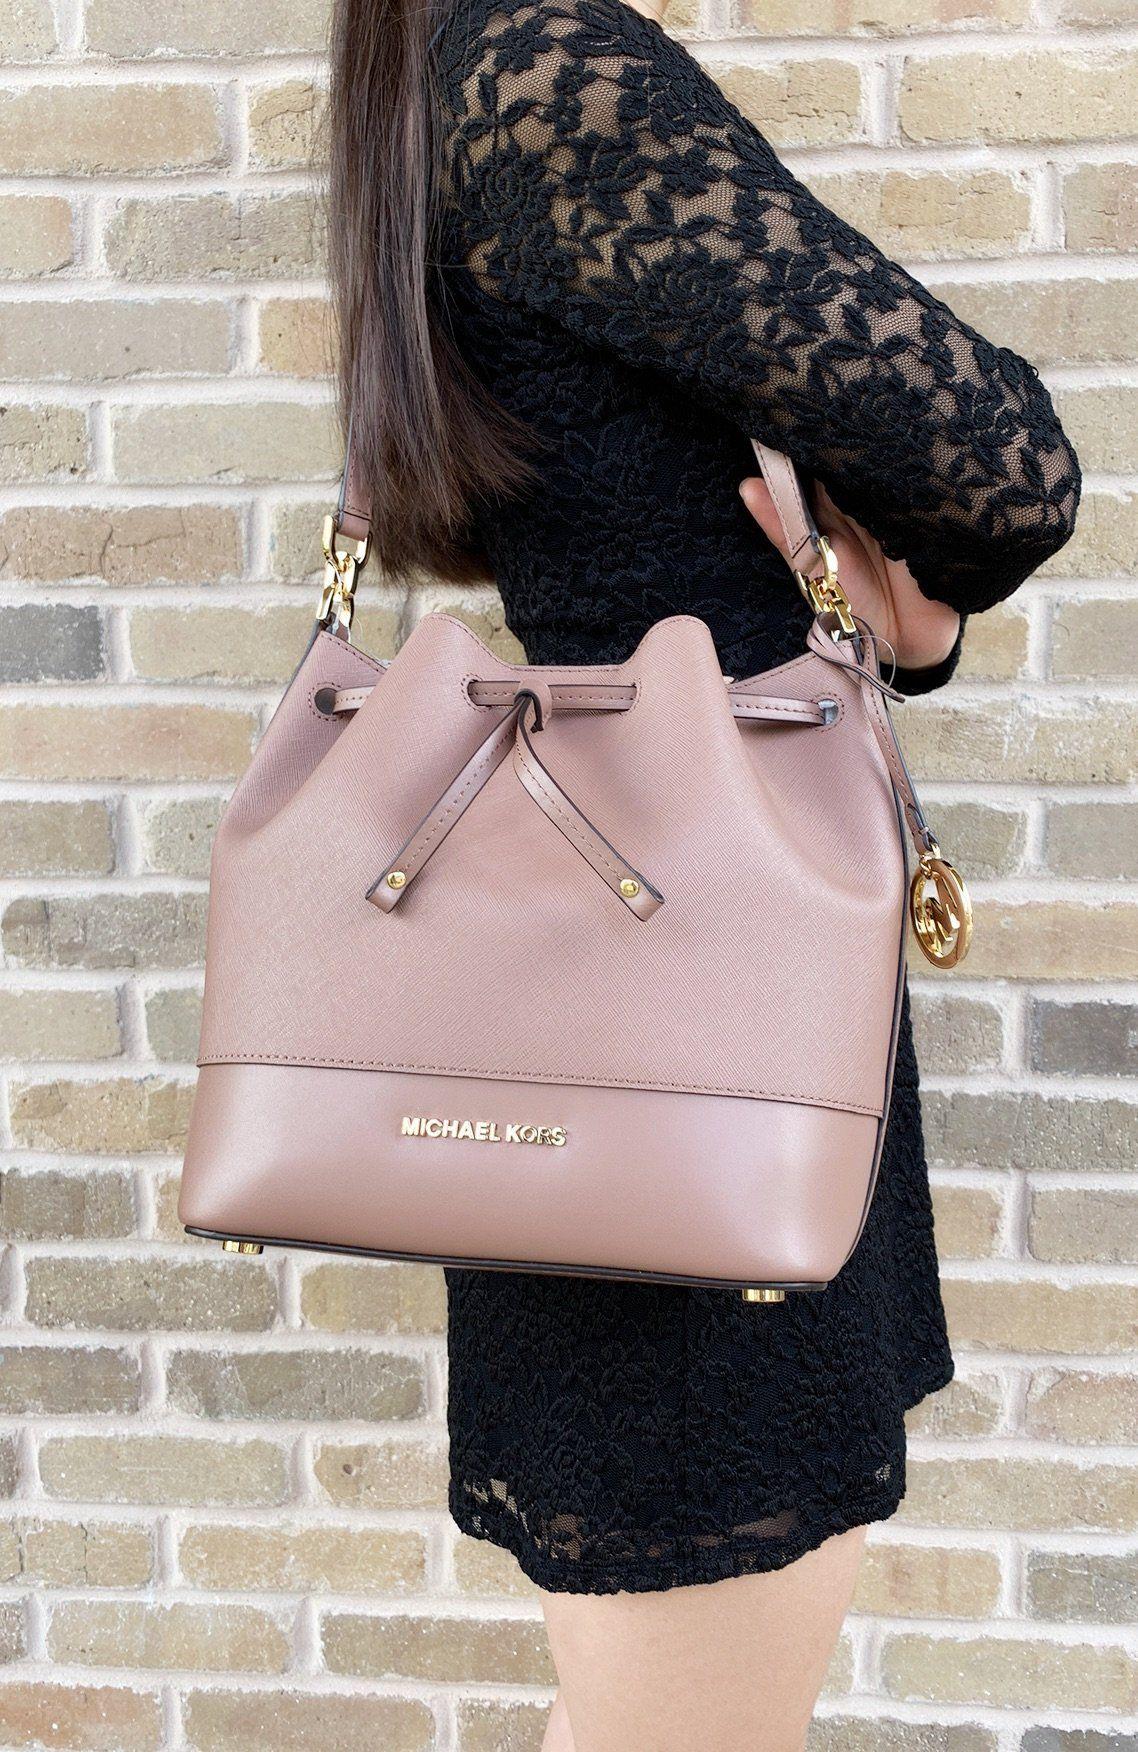 7b96a7b3ea2c Michael Kors Trista Medium Bucket Bag Dusty Rose Saffiano Leather   poshcloset  poshpackages  mercariseller